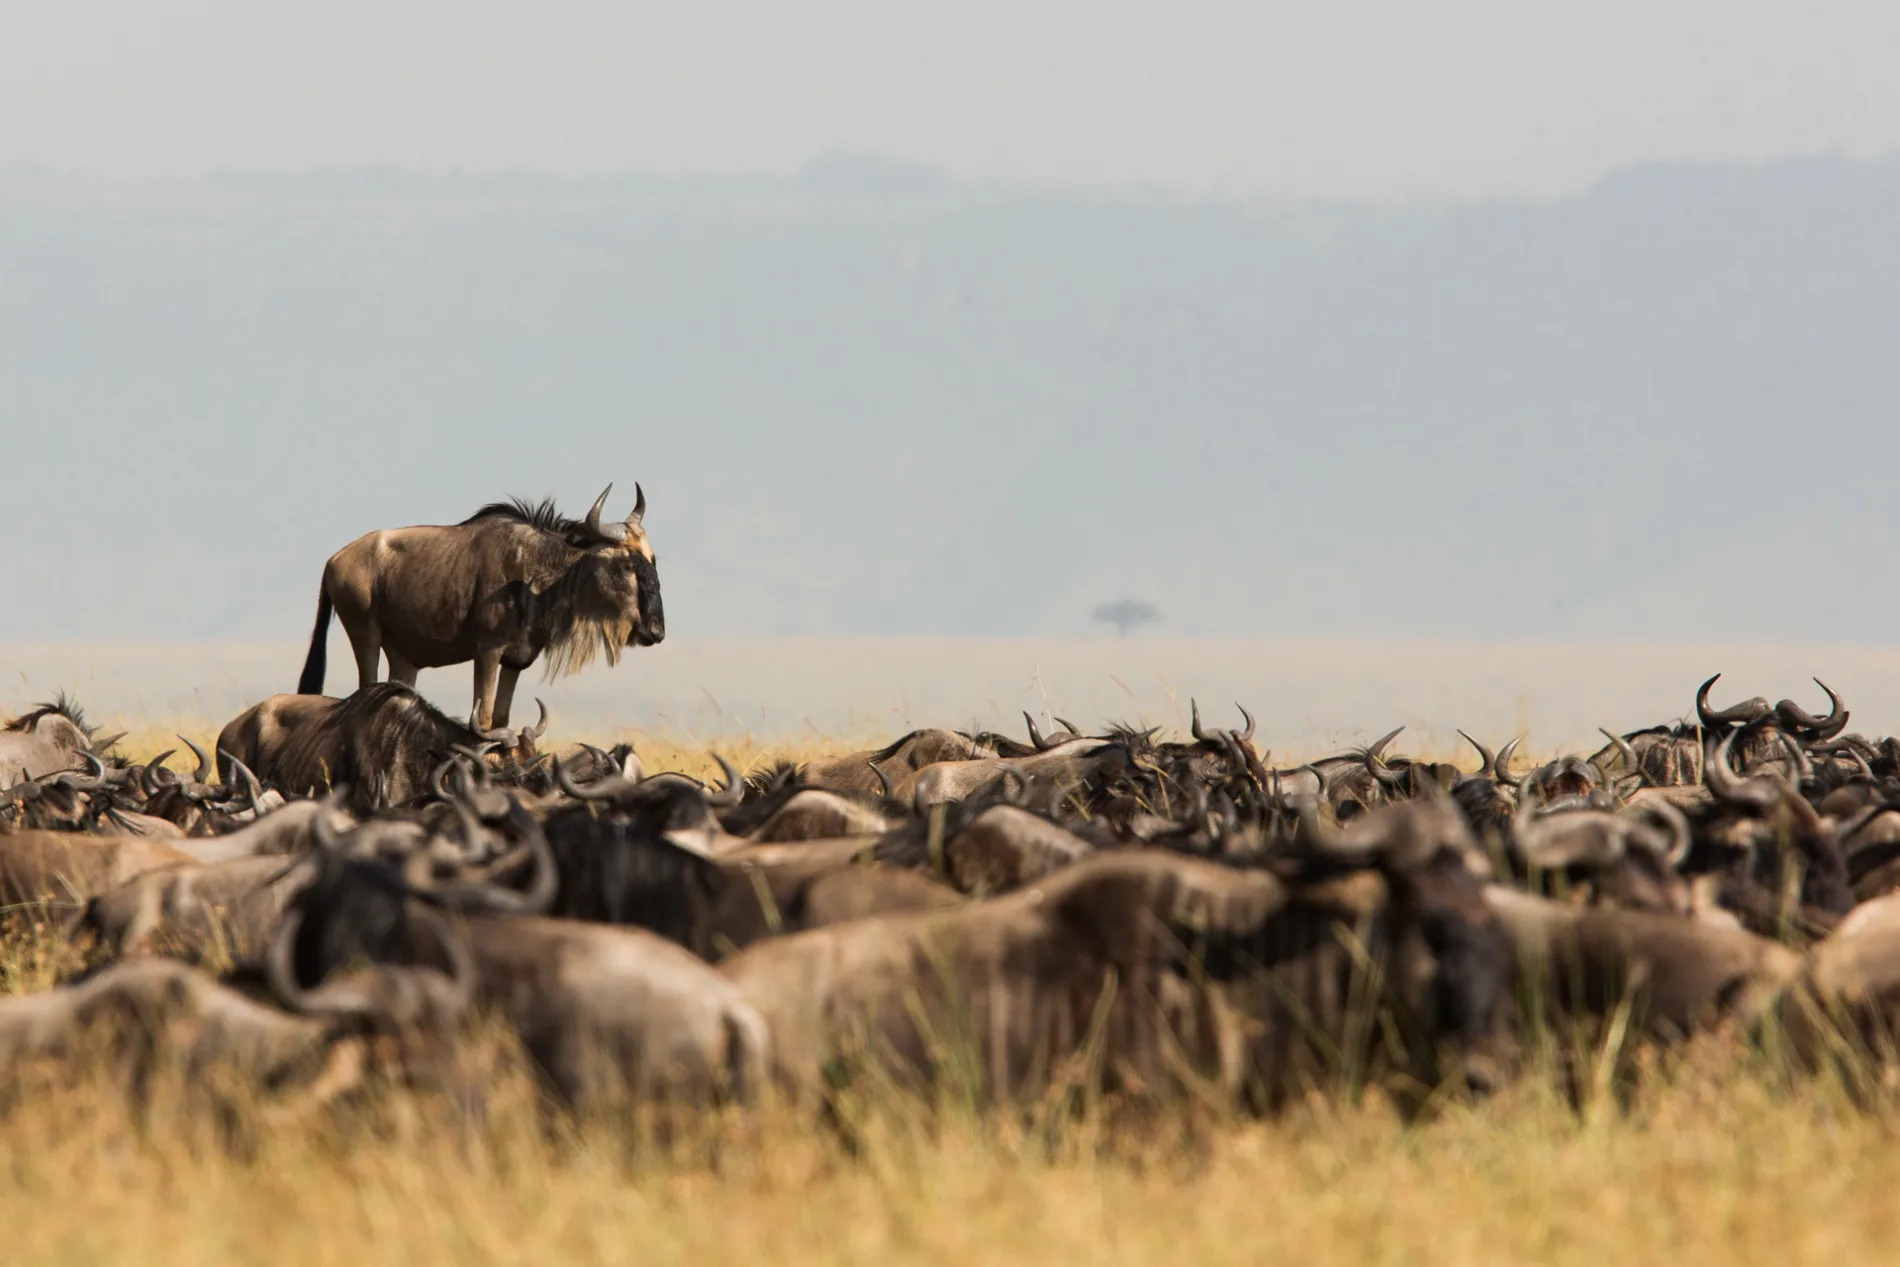 Wildebeest raised up